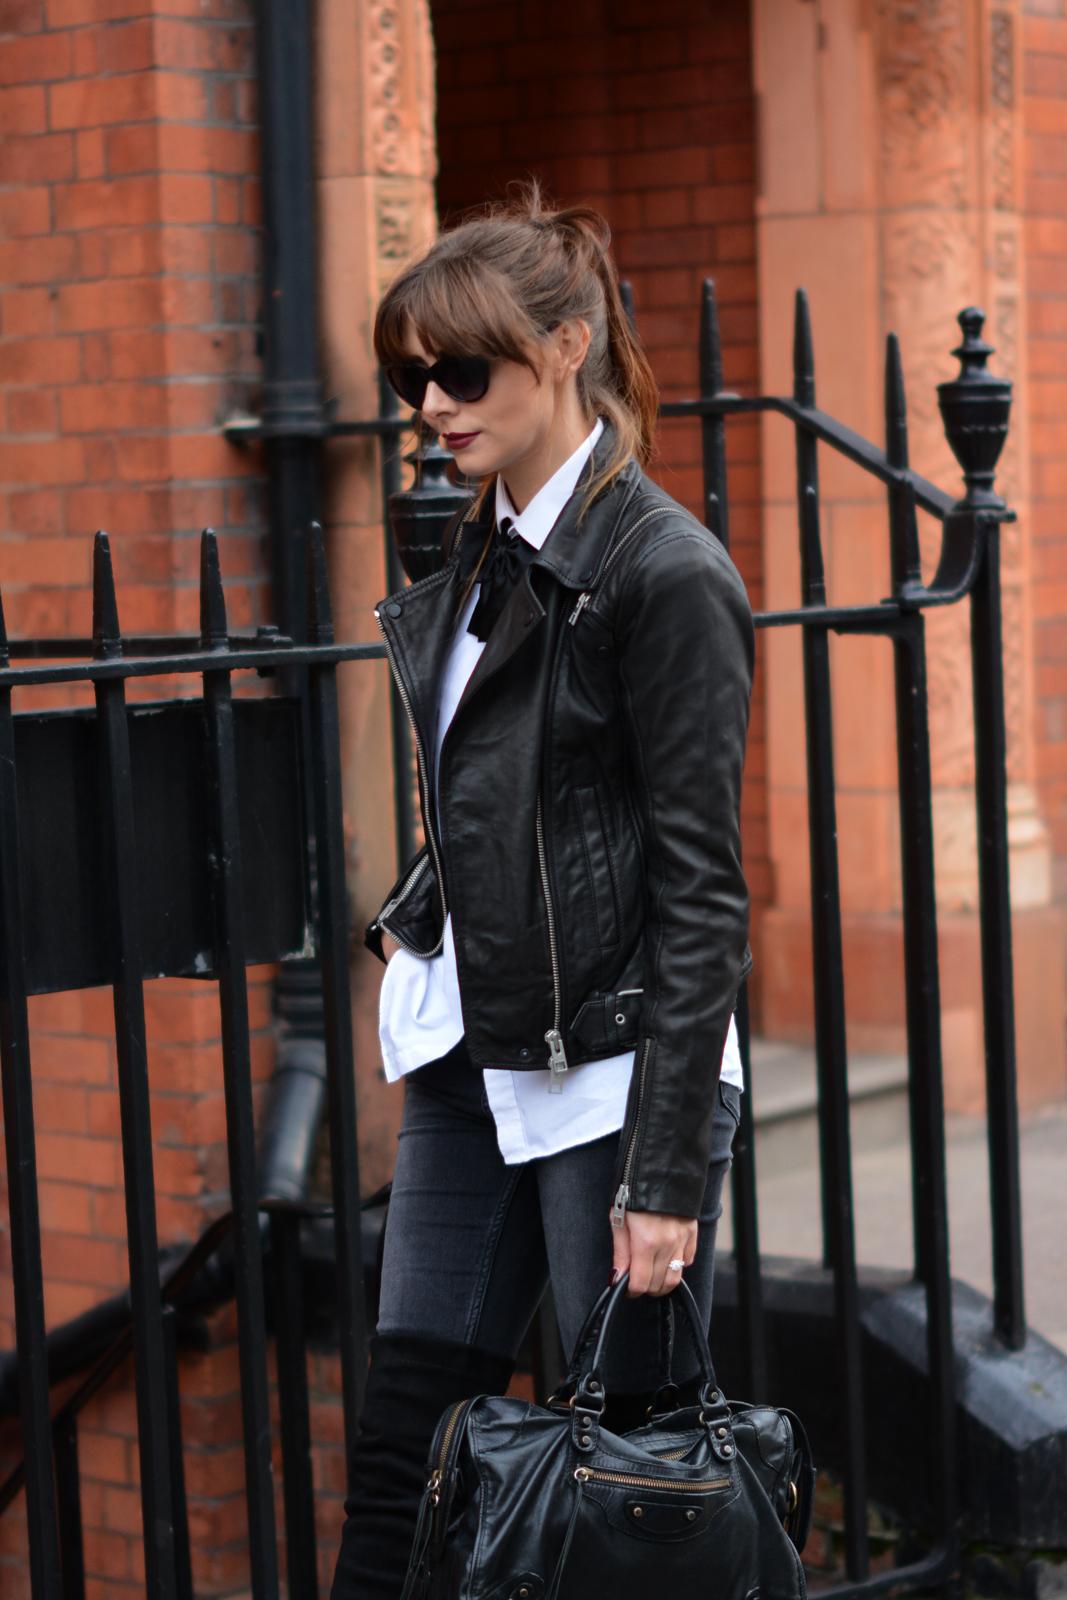 EJSTYLE - Black bowtie, all saints leather biker jacket, white shirt, black acid wash skinny jeans, OTK boots, Balenciaga city bag